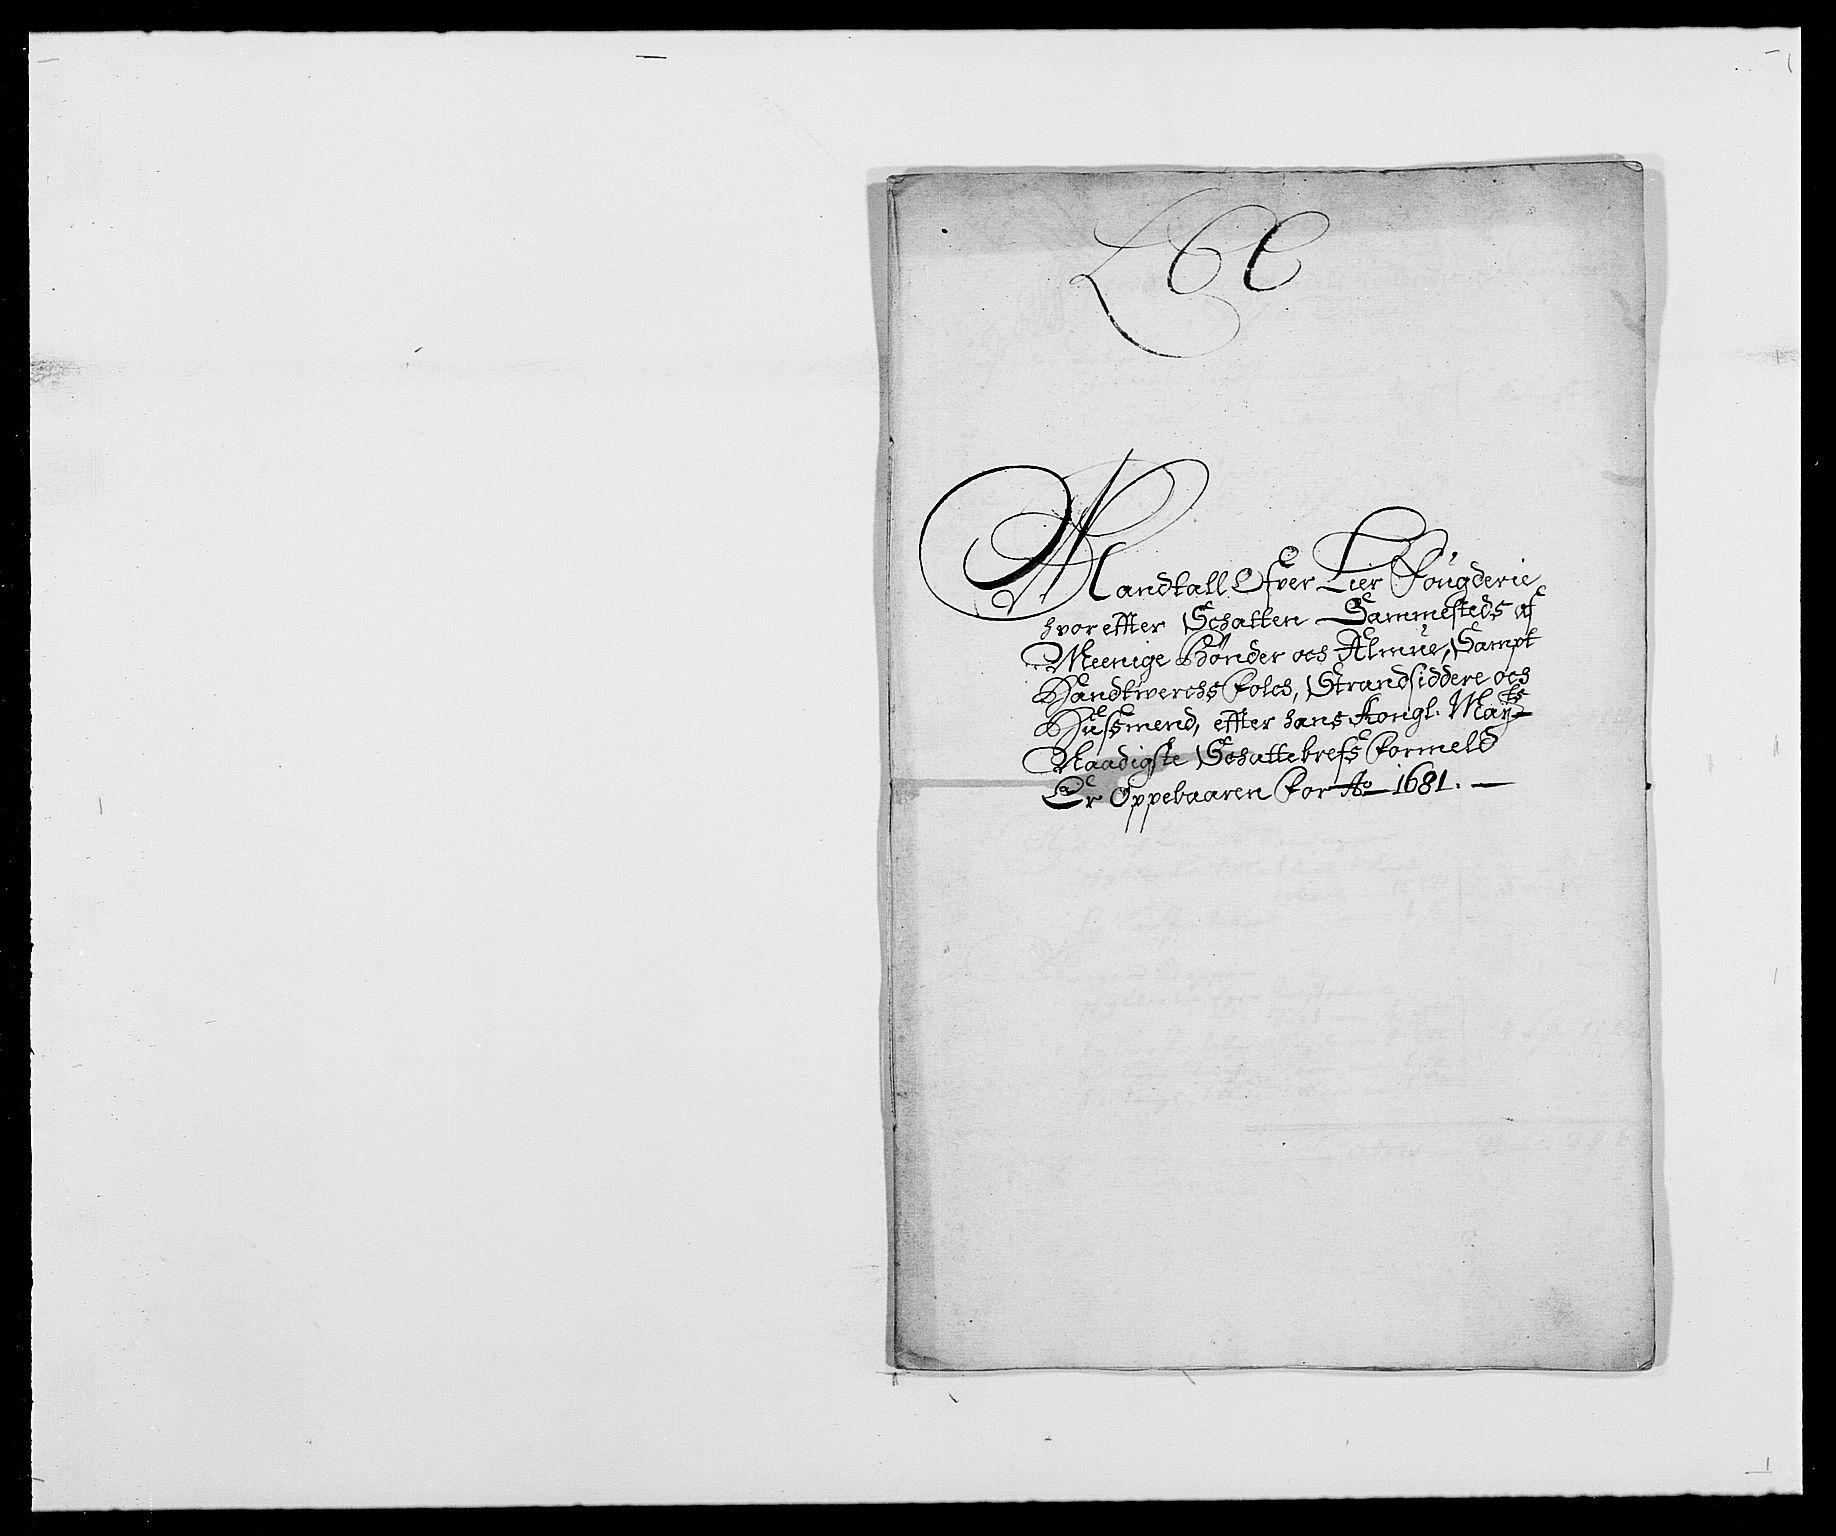 RA, Rentekammeret inntil 1814, Reviderte regnskaper, Fogderegnskap, R27/L1686: Fogderegnskap Lier, 1678-1686, s. 311